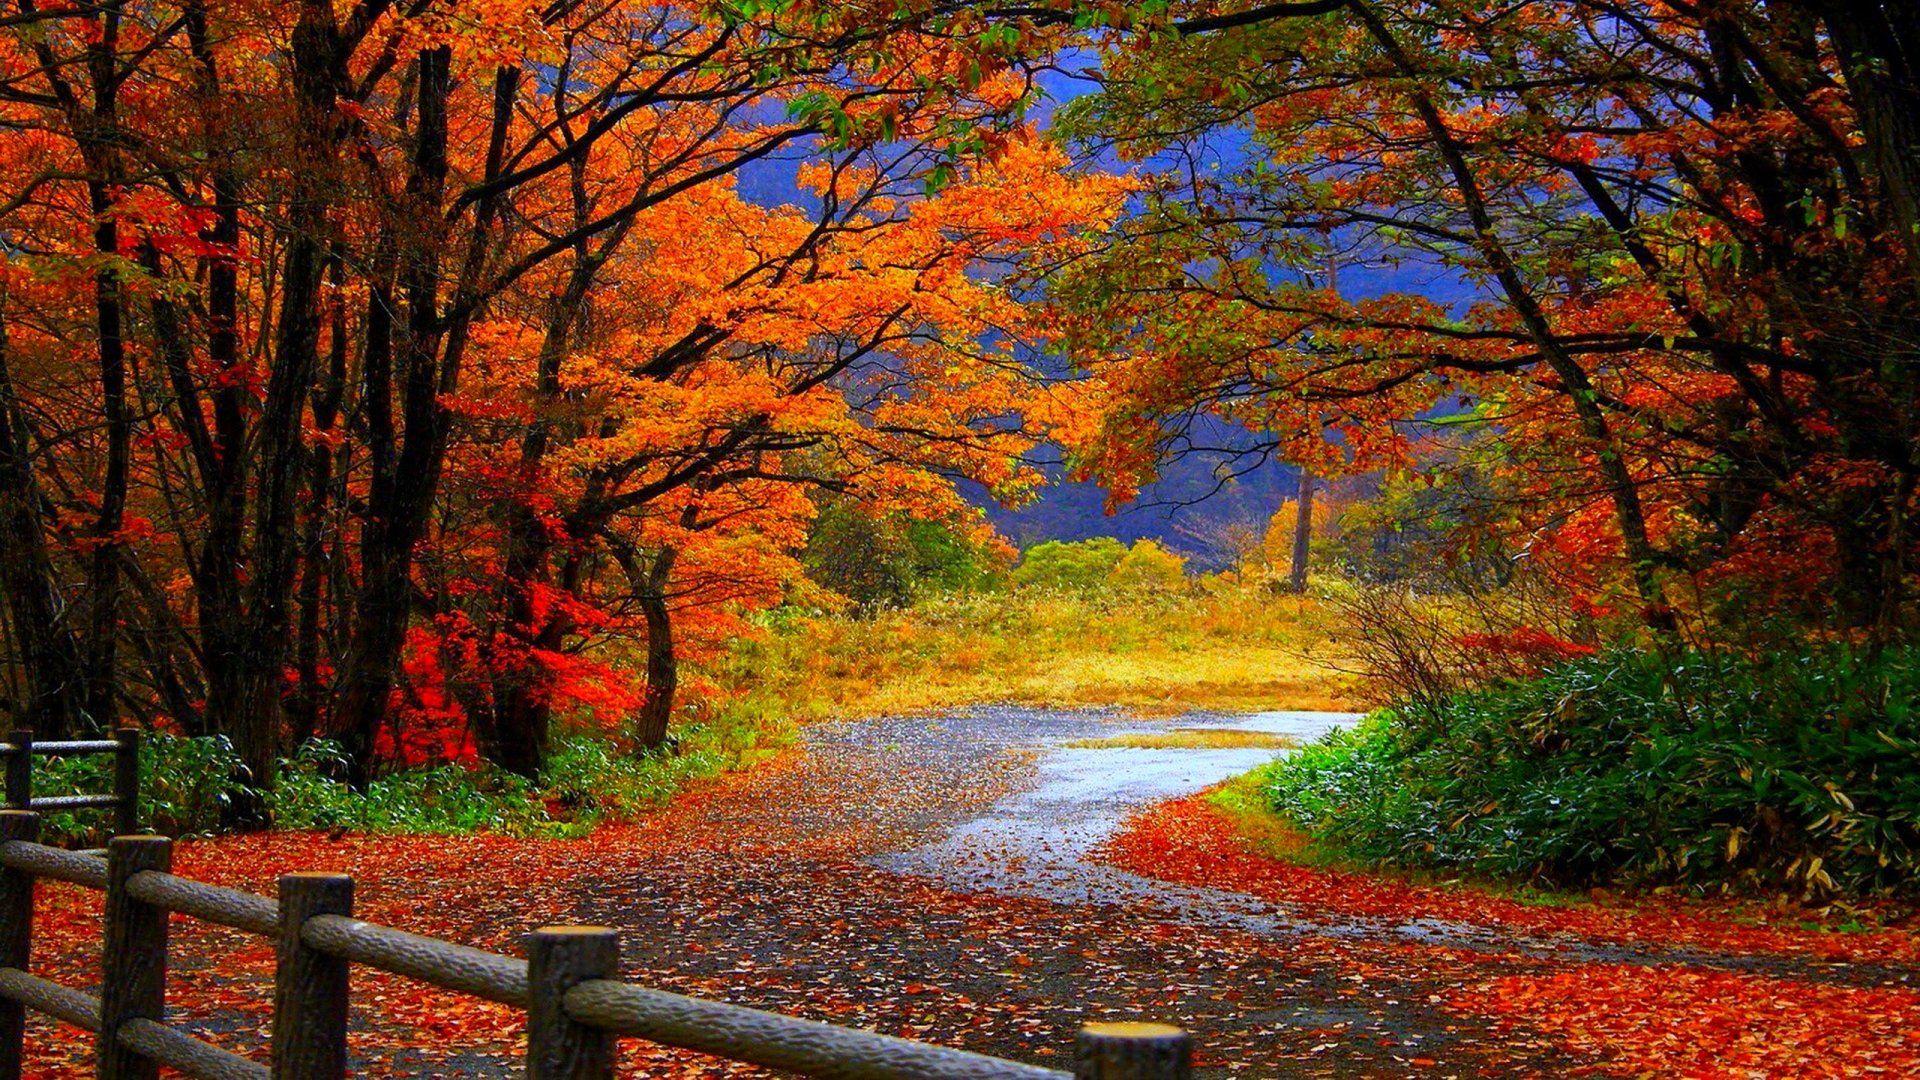 Autumn Fall Trees Fence Path Trail Colorful Leaves Foliage Wallpaper 1920x1080 524504 Wallp Scenery Wallpaper Landscape Wallpaper Desktop Wallpaper Fall